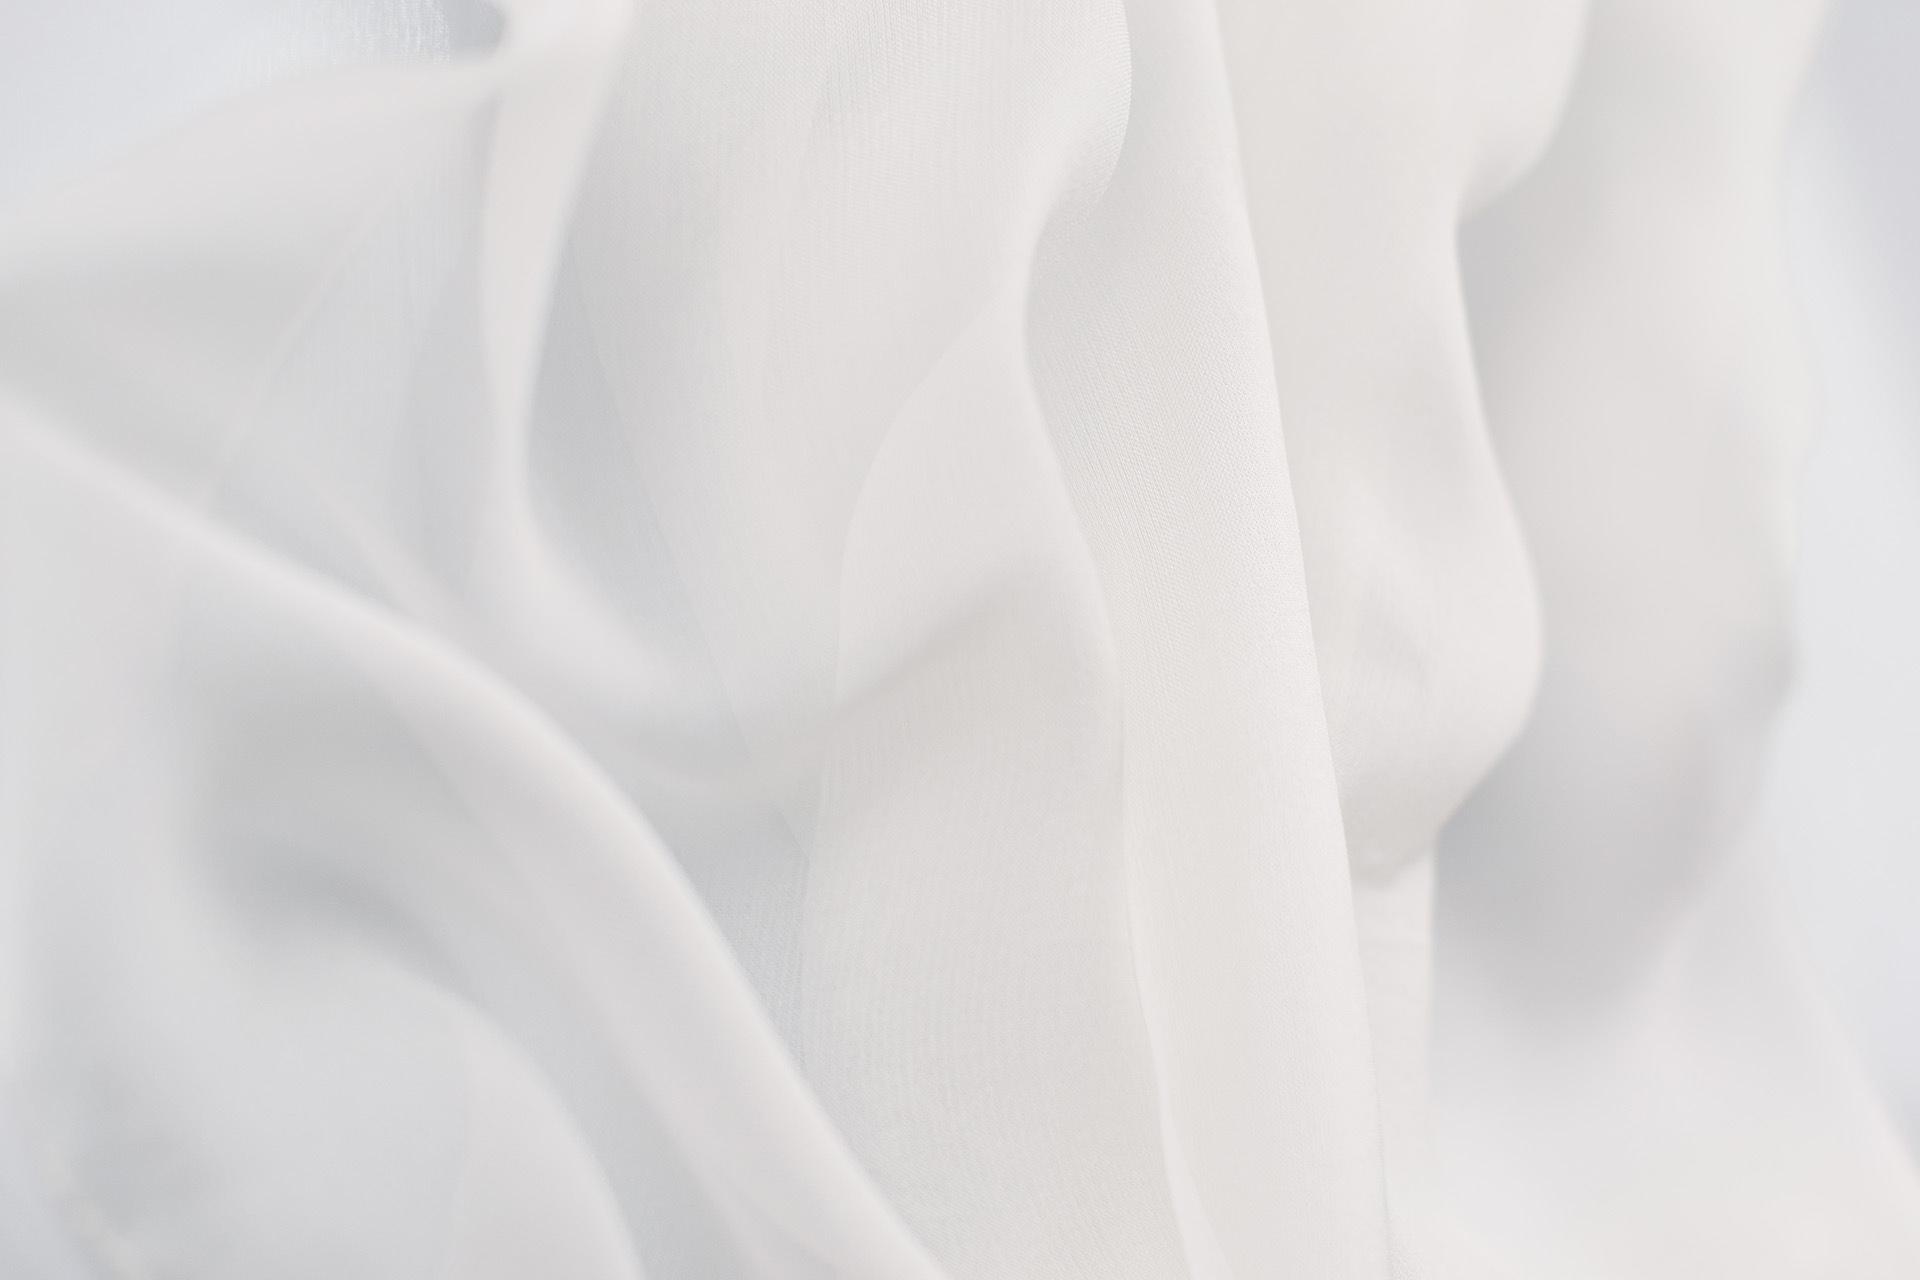 interiorfabrics-silk-luxurydesign-textile